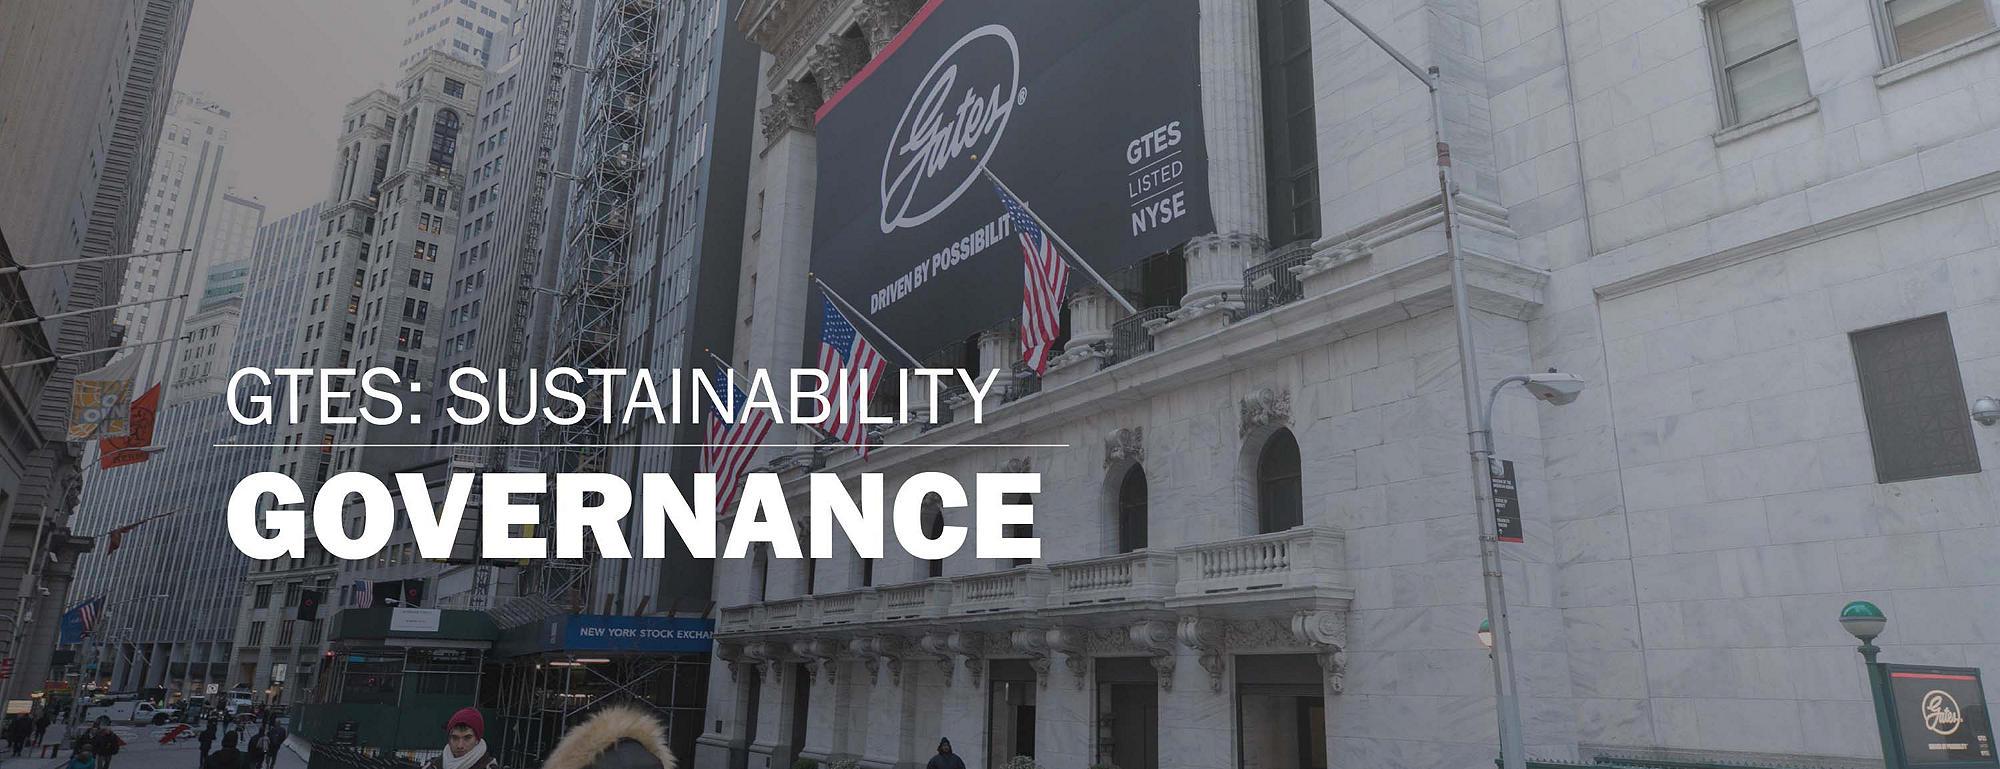 sustainability-corporate-governance